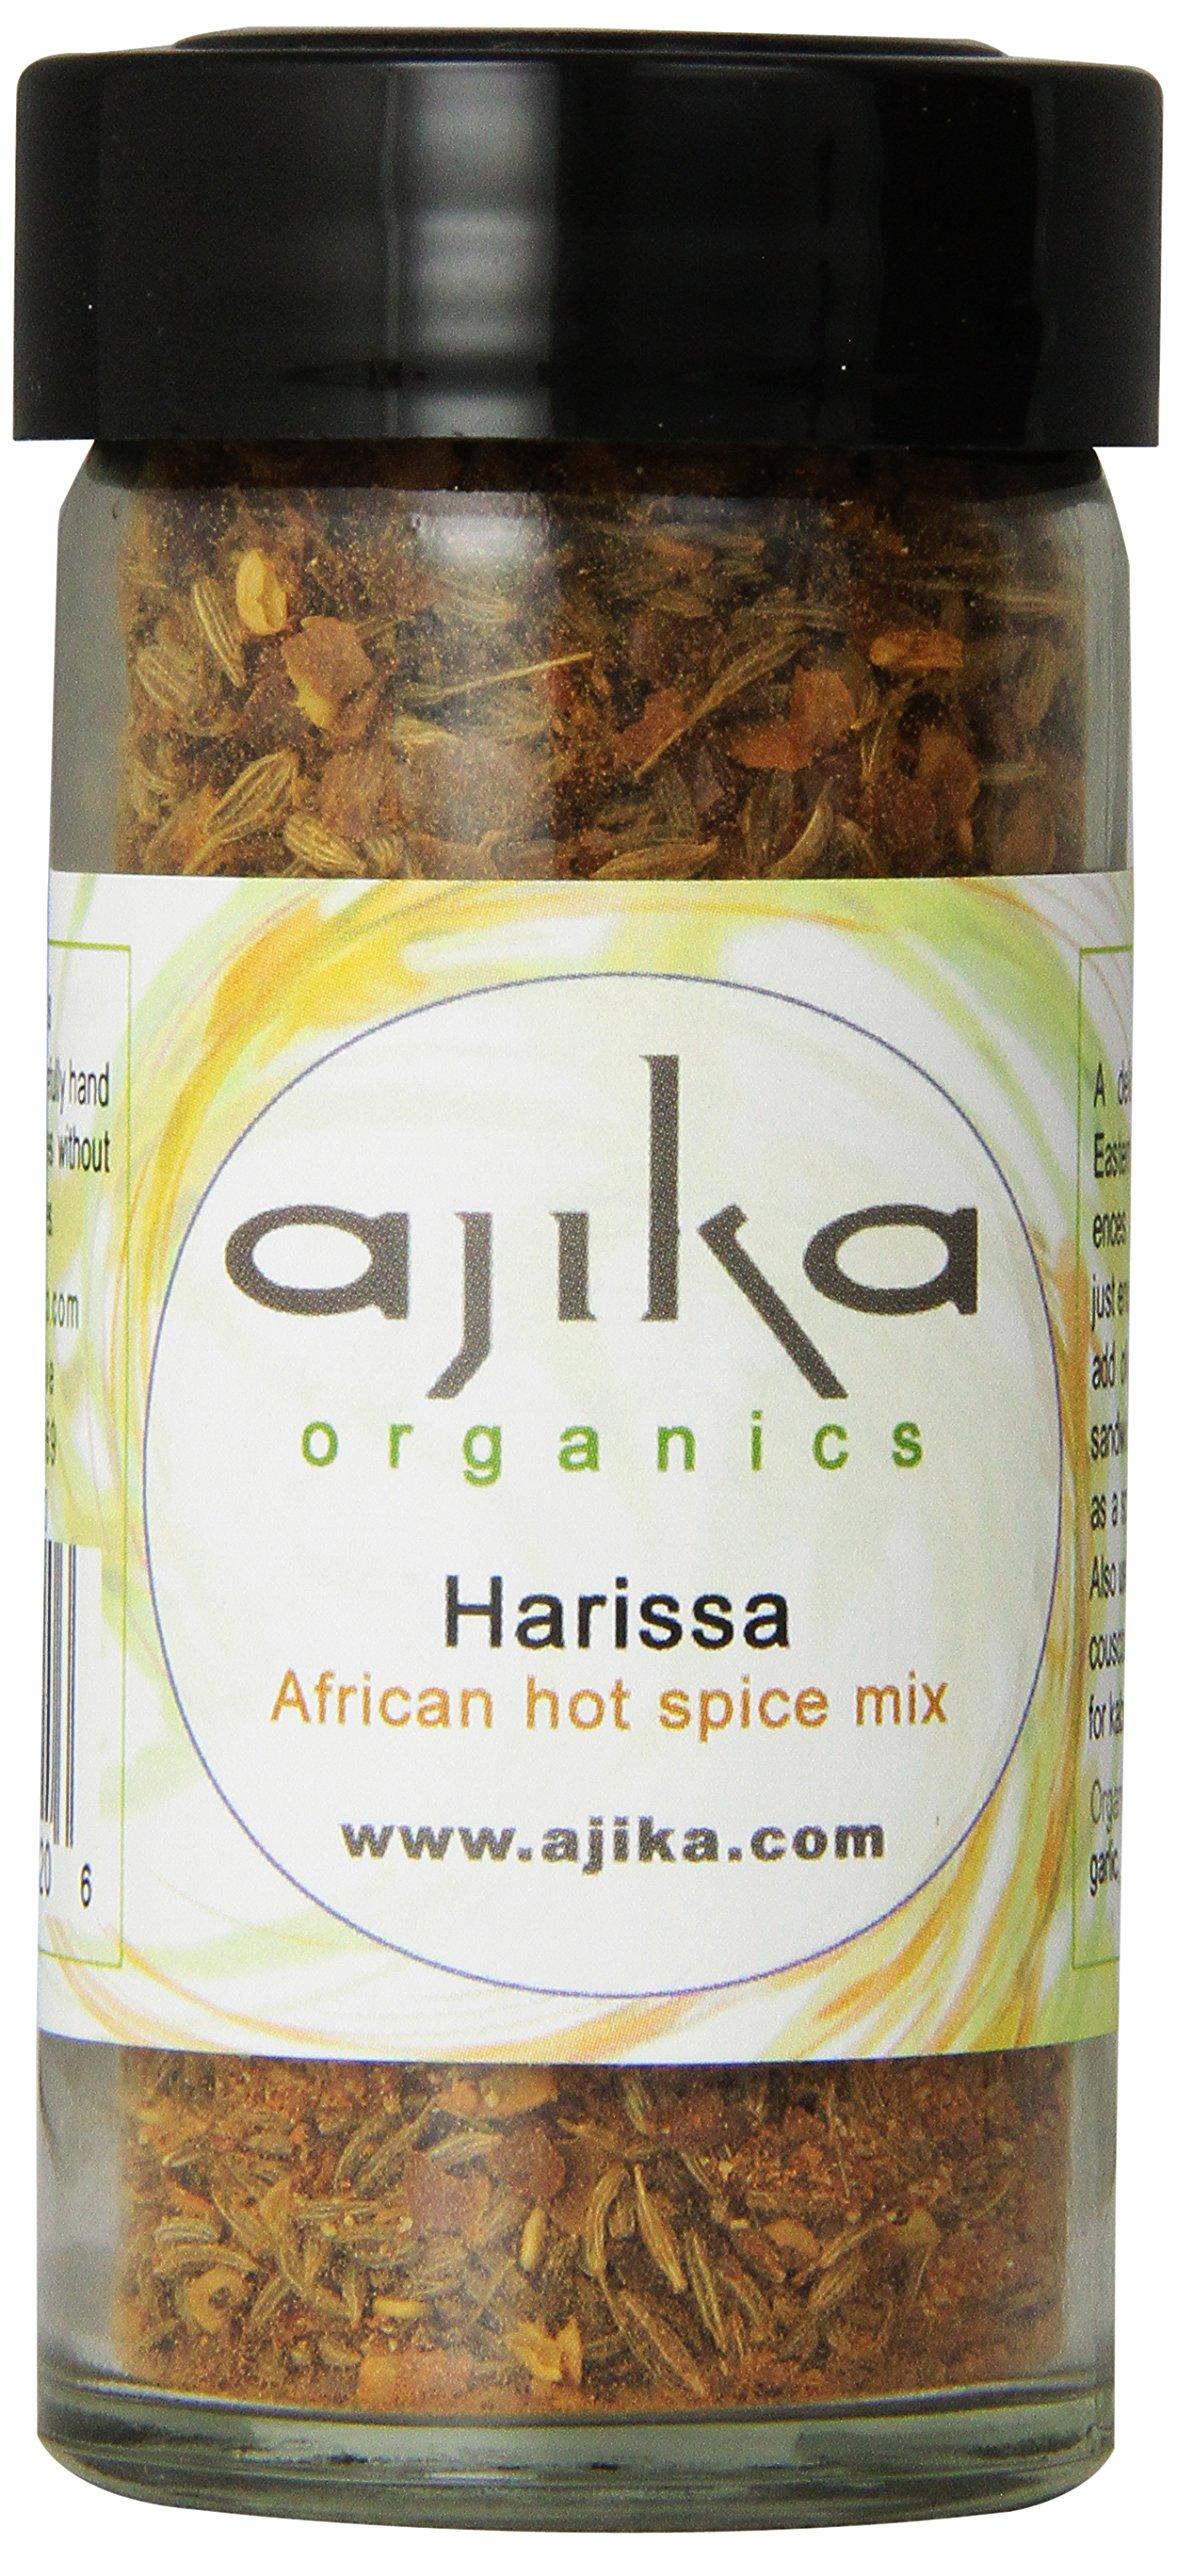 Ajika Organic Harissa Spice Blend - Hot Chili Seasoning From Africa, 2.0-Ounce